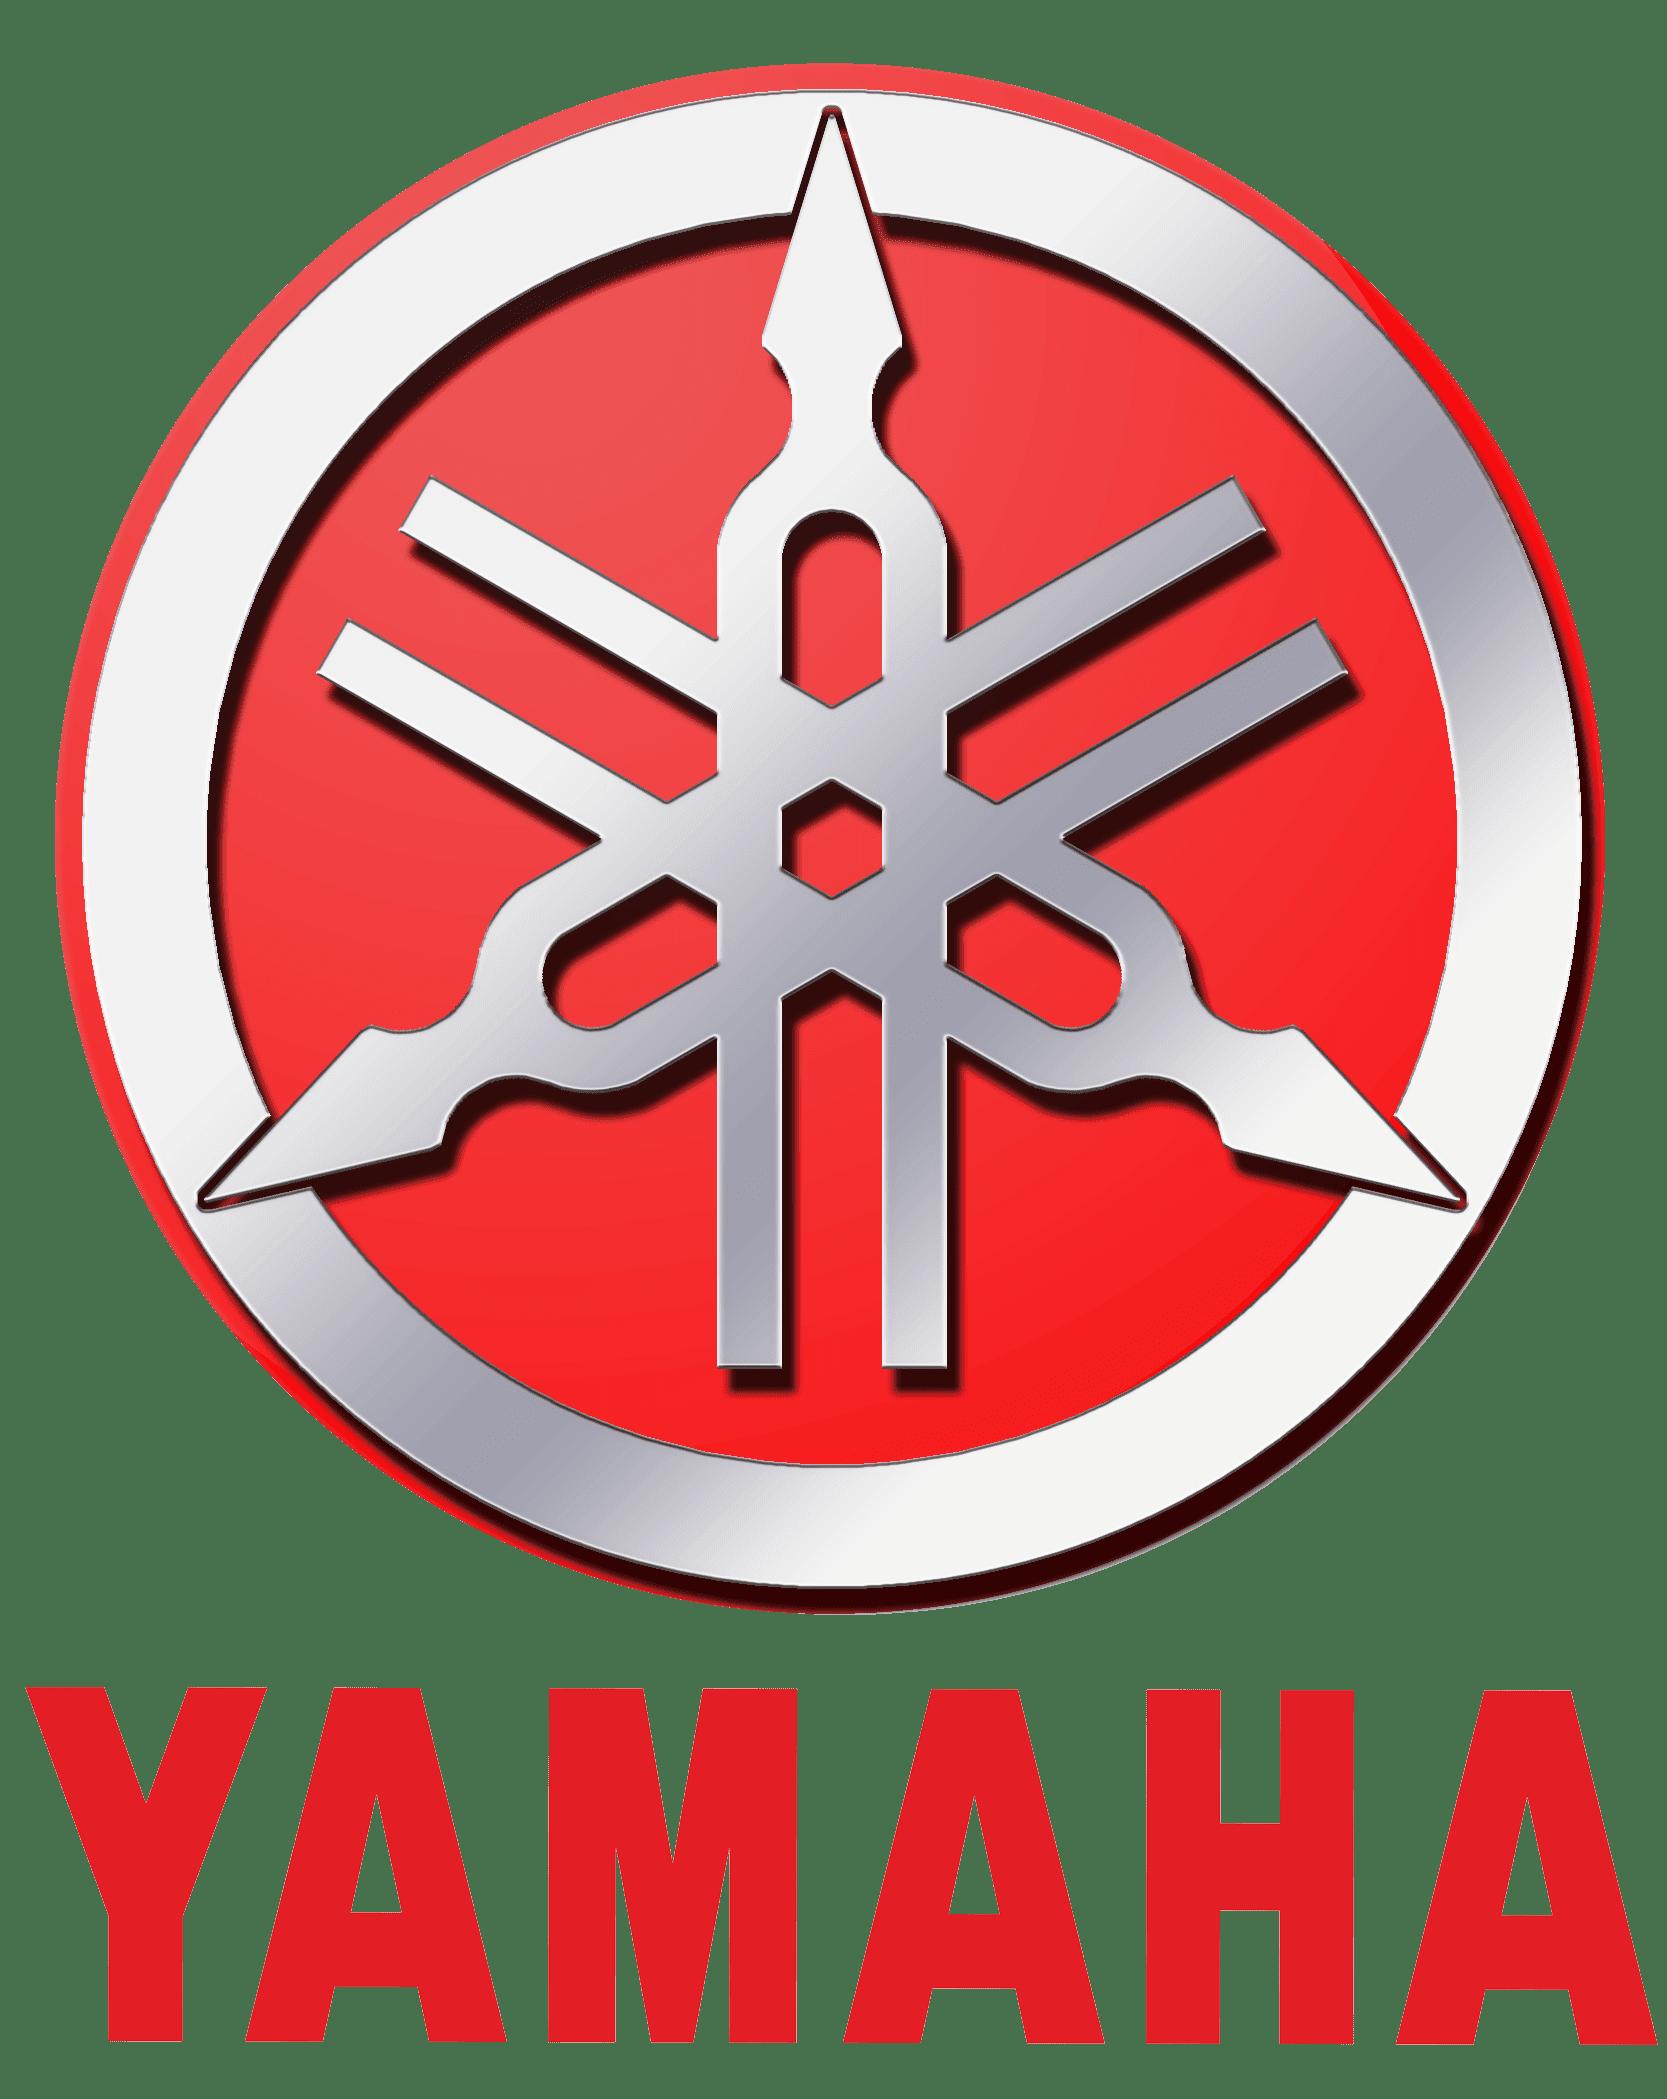 https://www.yamaha-motor.eu/fr/fr/